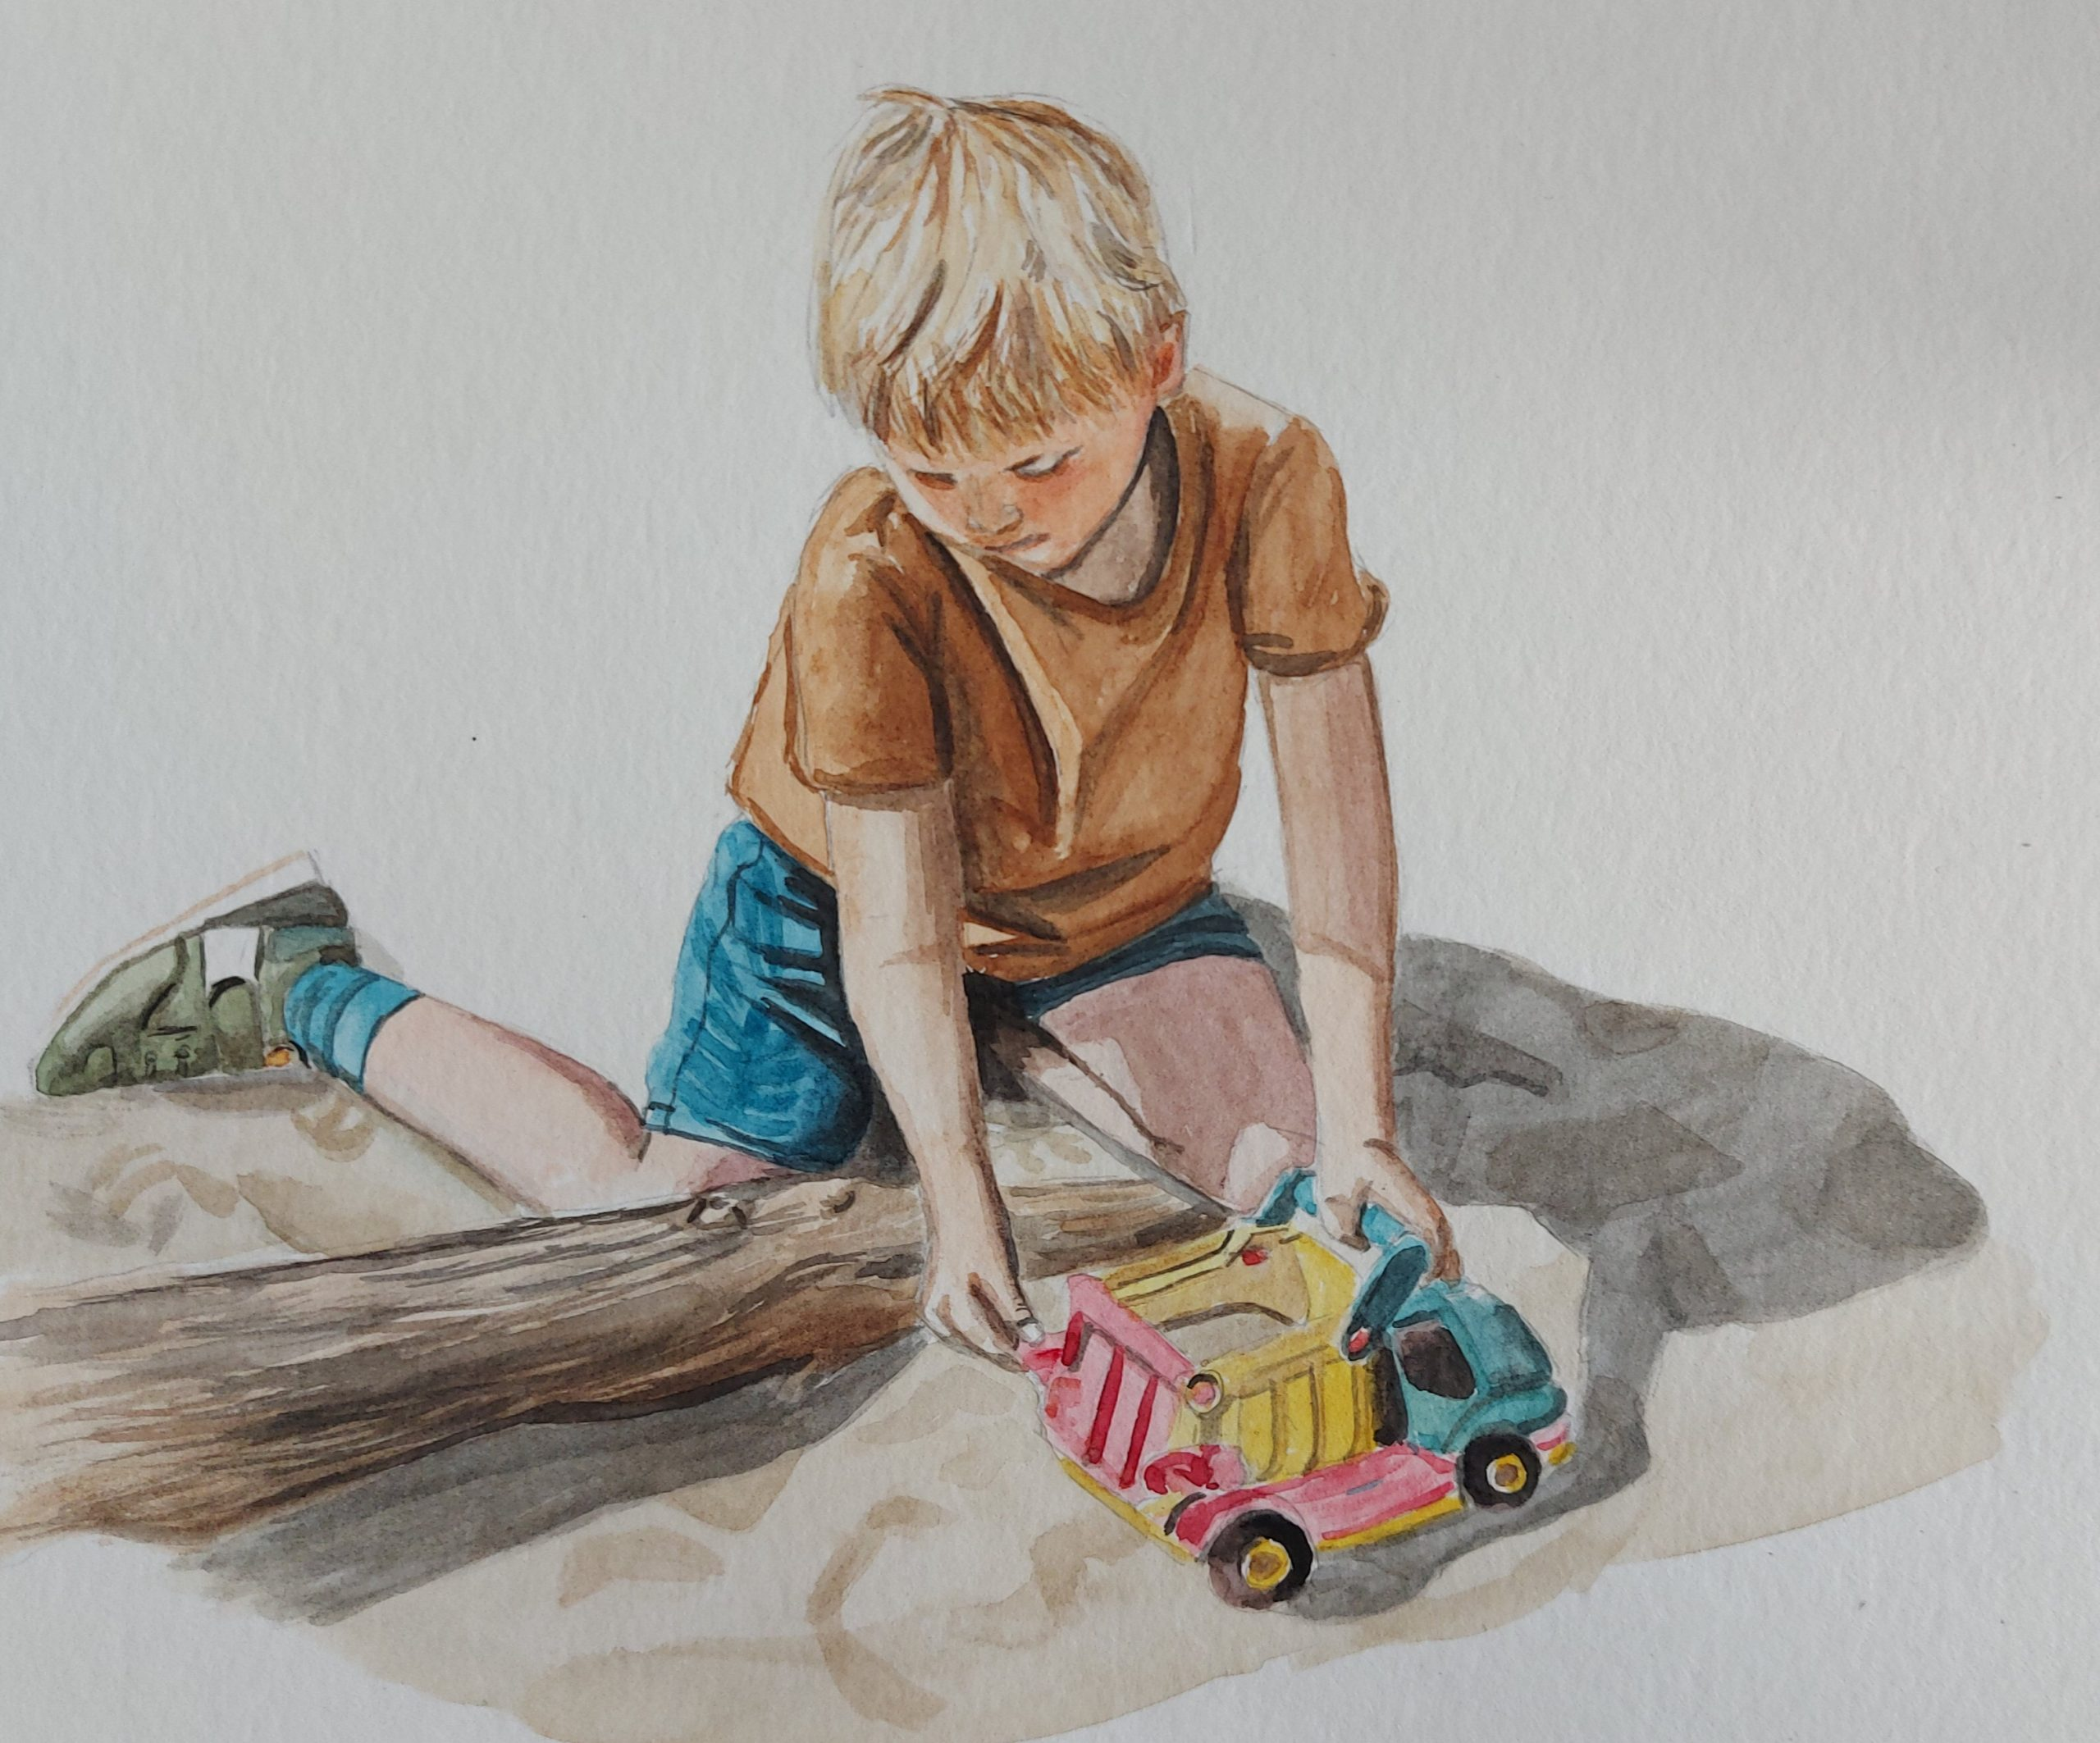 Odin in het zand – aquarel op papier – eigen werk